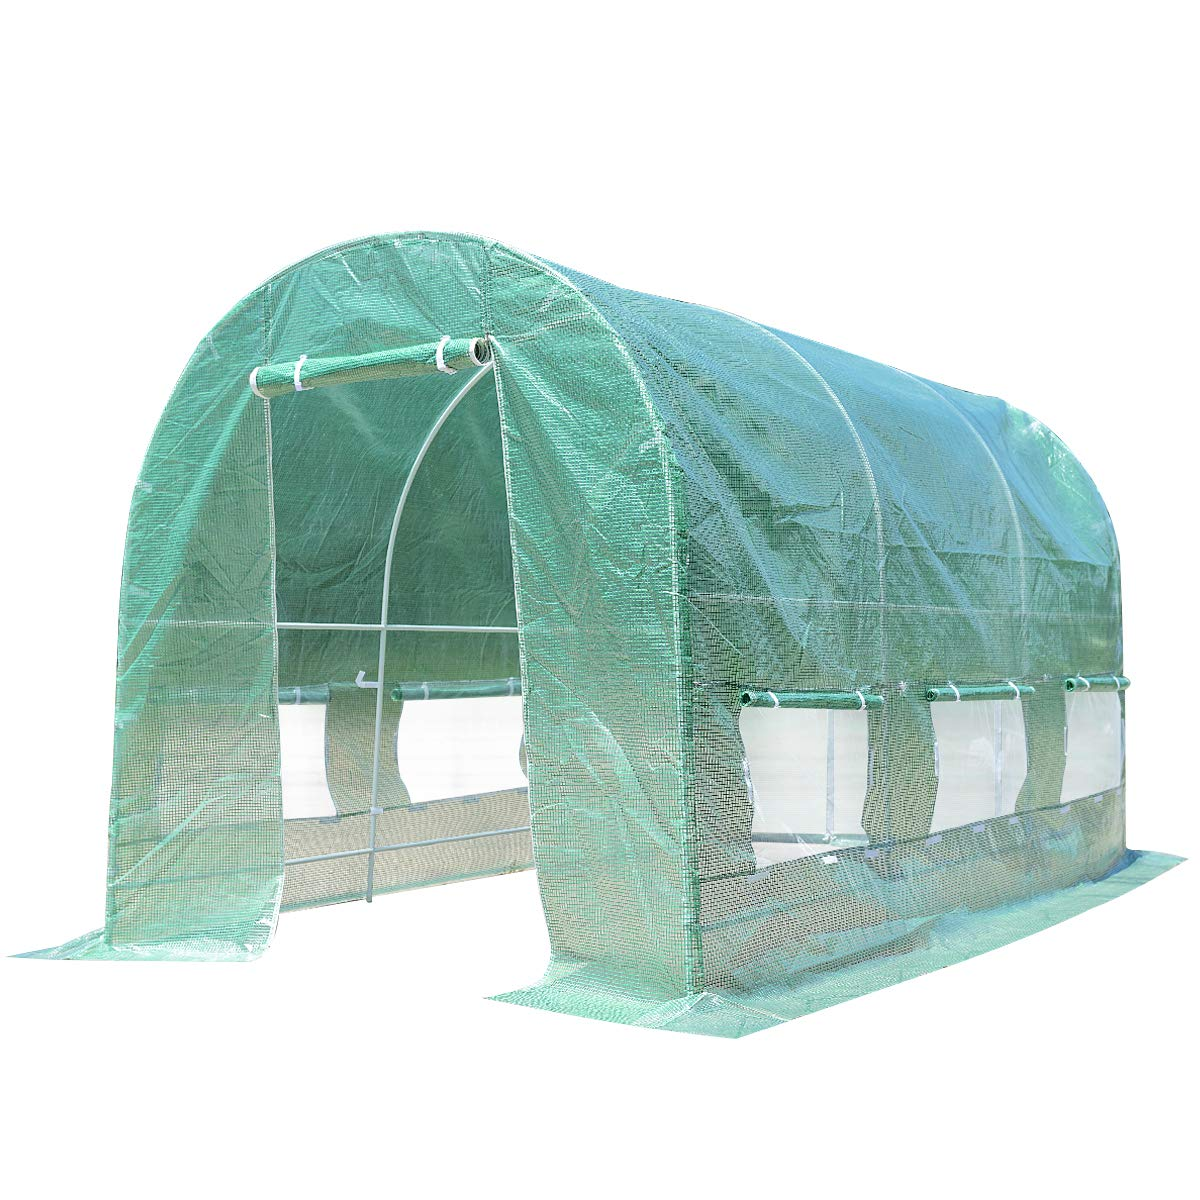 Giantex Portable Walk in Greenhouse Plant Grow Tents Steel Frame Garden Backyard Outdoor Gardening Green House w/ 6 Windows & Doors (11.5'X 6.5'X6.5') by Giantex